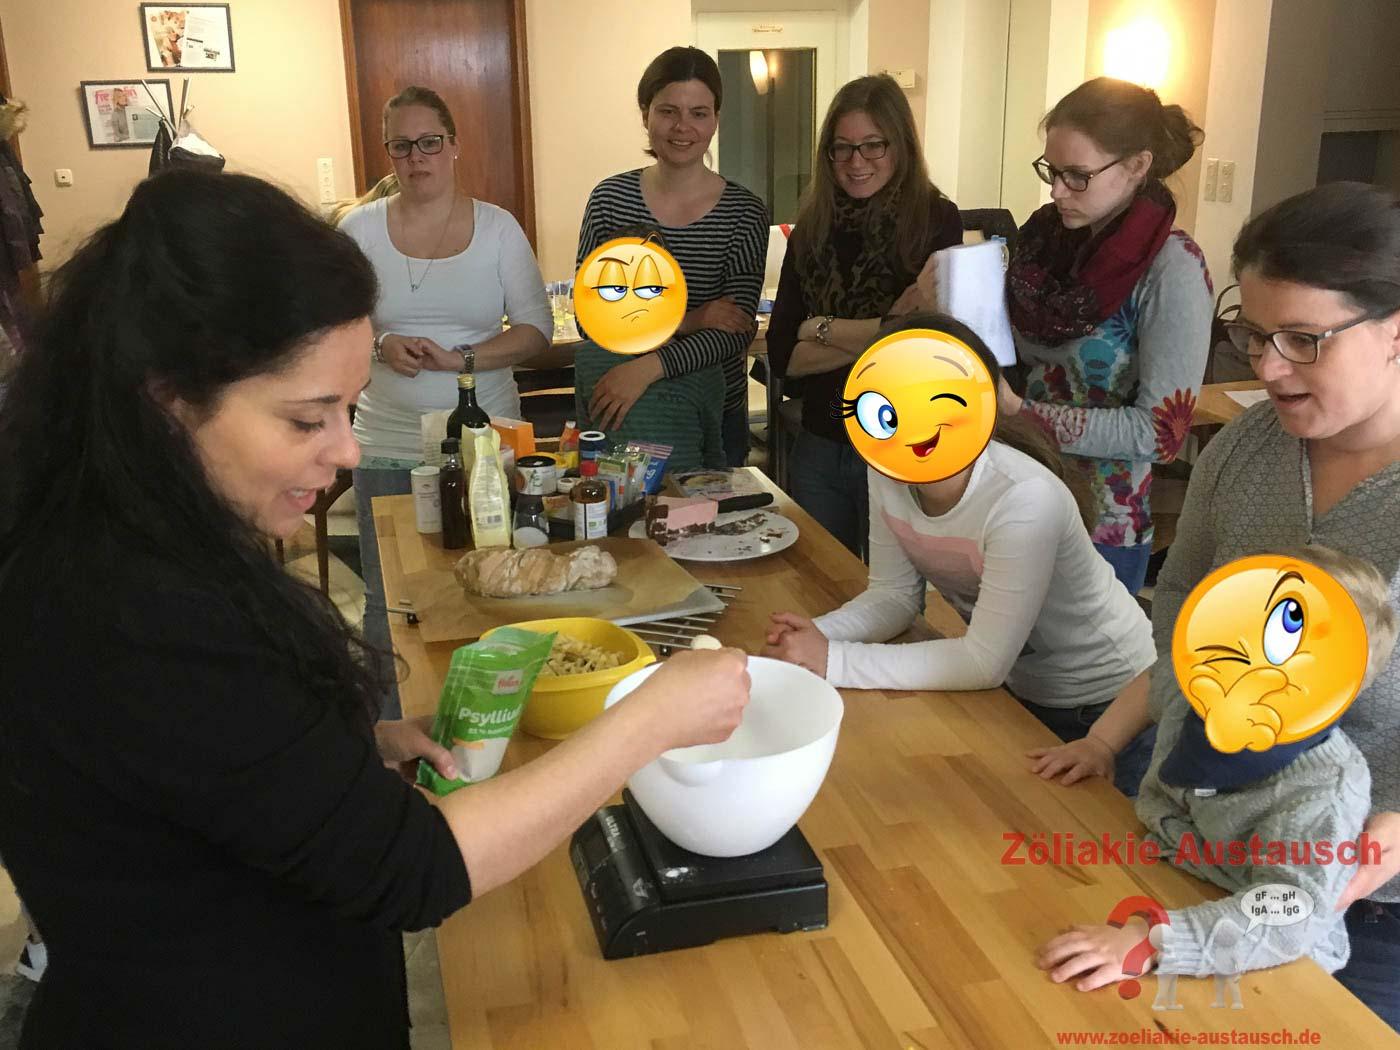 Zoeliakie_Austausch_Tanja_Gruber-Backkurs_2017-031